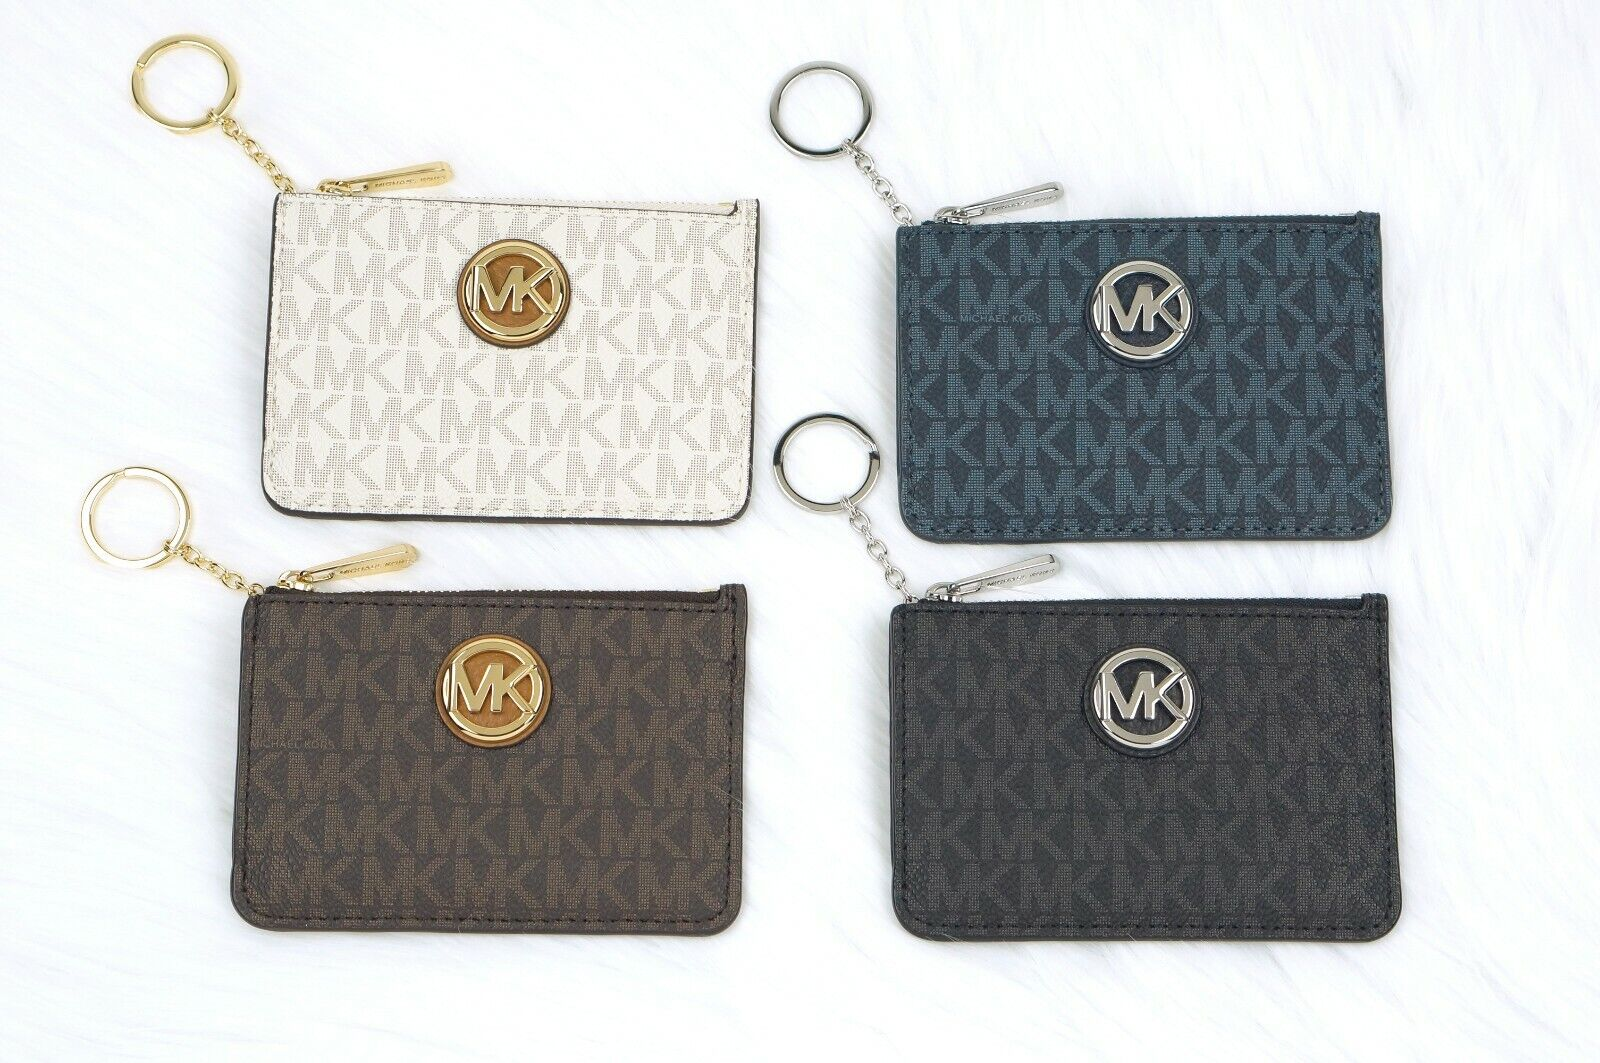 Michael Kors FULTON jet set Coin Pouch Wallet Card ID Case w